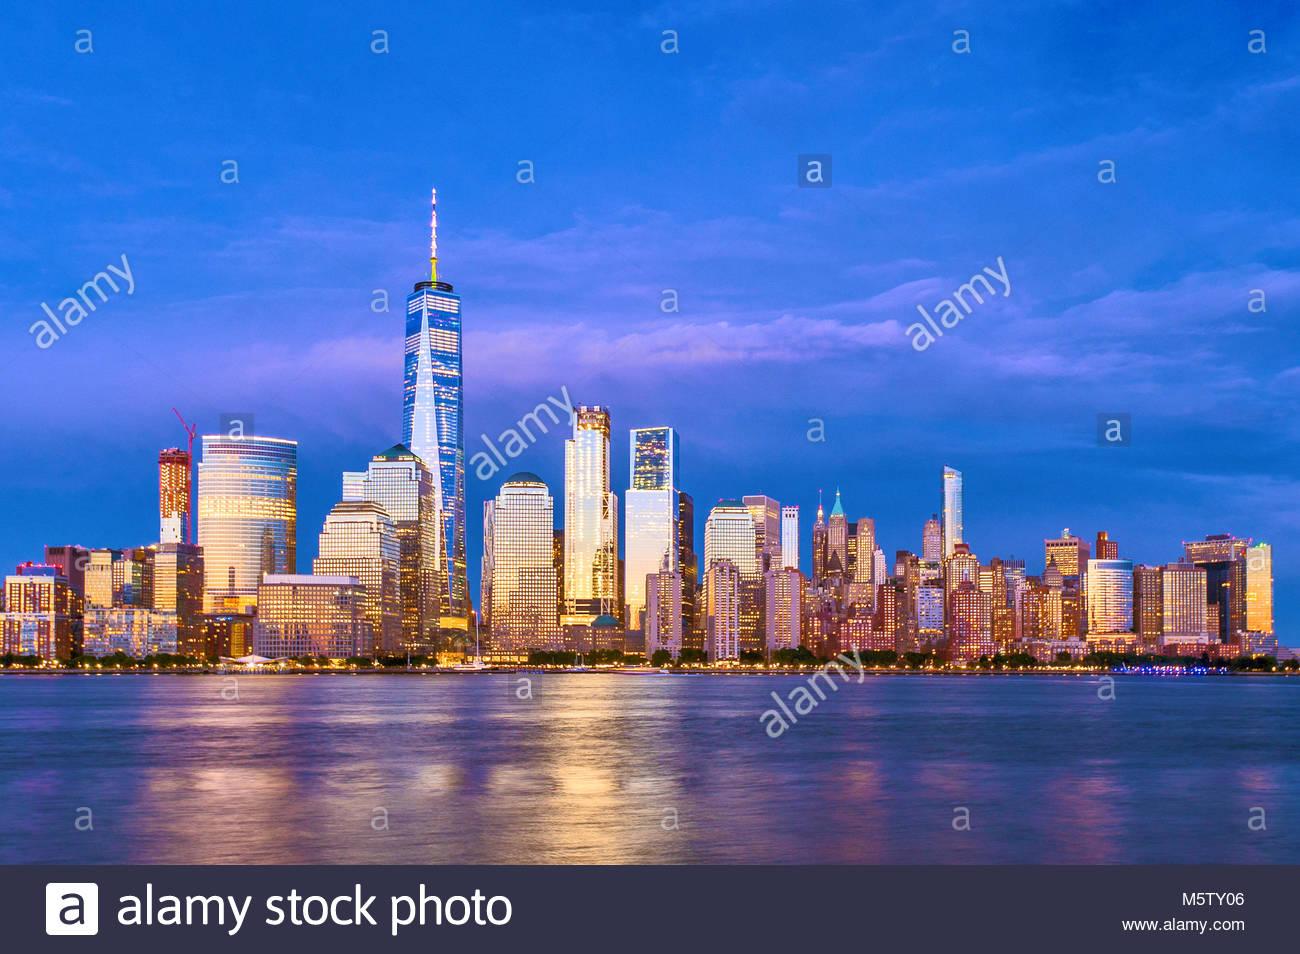 New York Skyline One World Trade Center WTC Freedom Tower - Stock Image